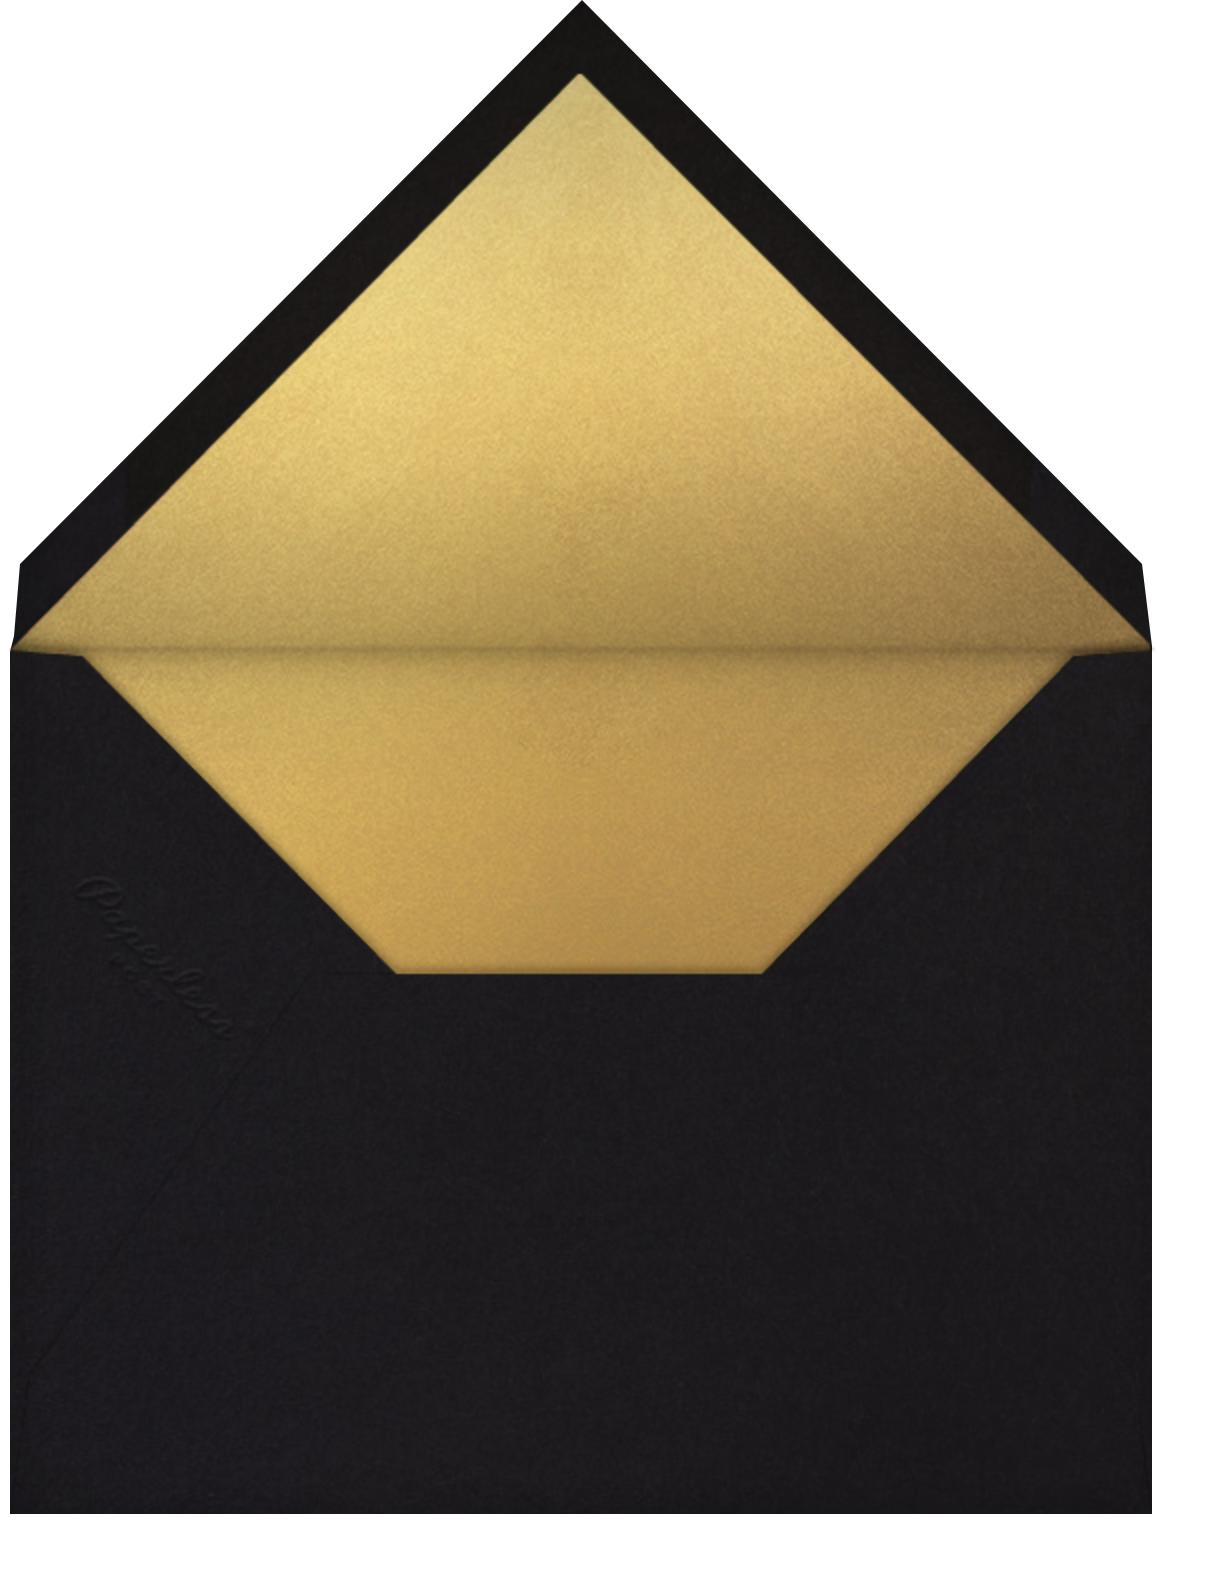 Around the Sun - Paperless Post - Adult birthday - envelope back